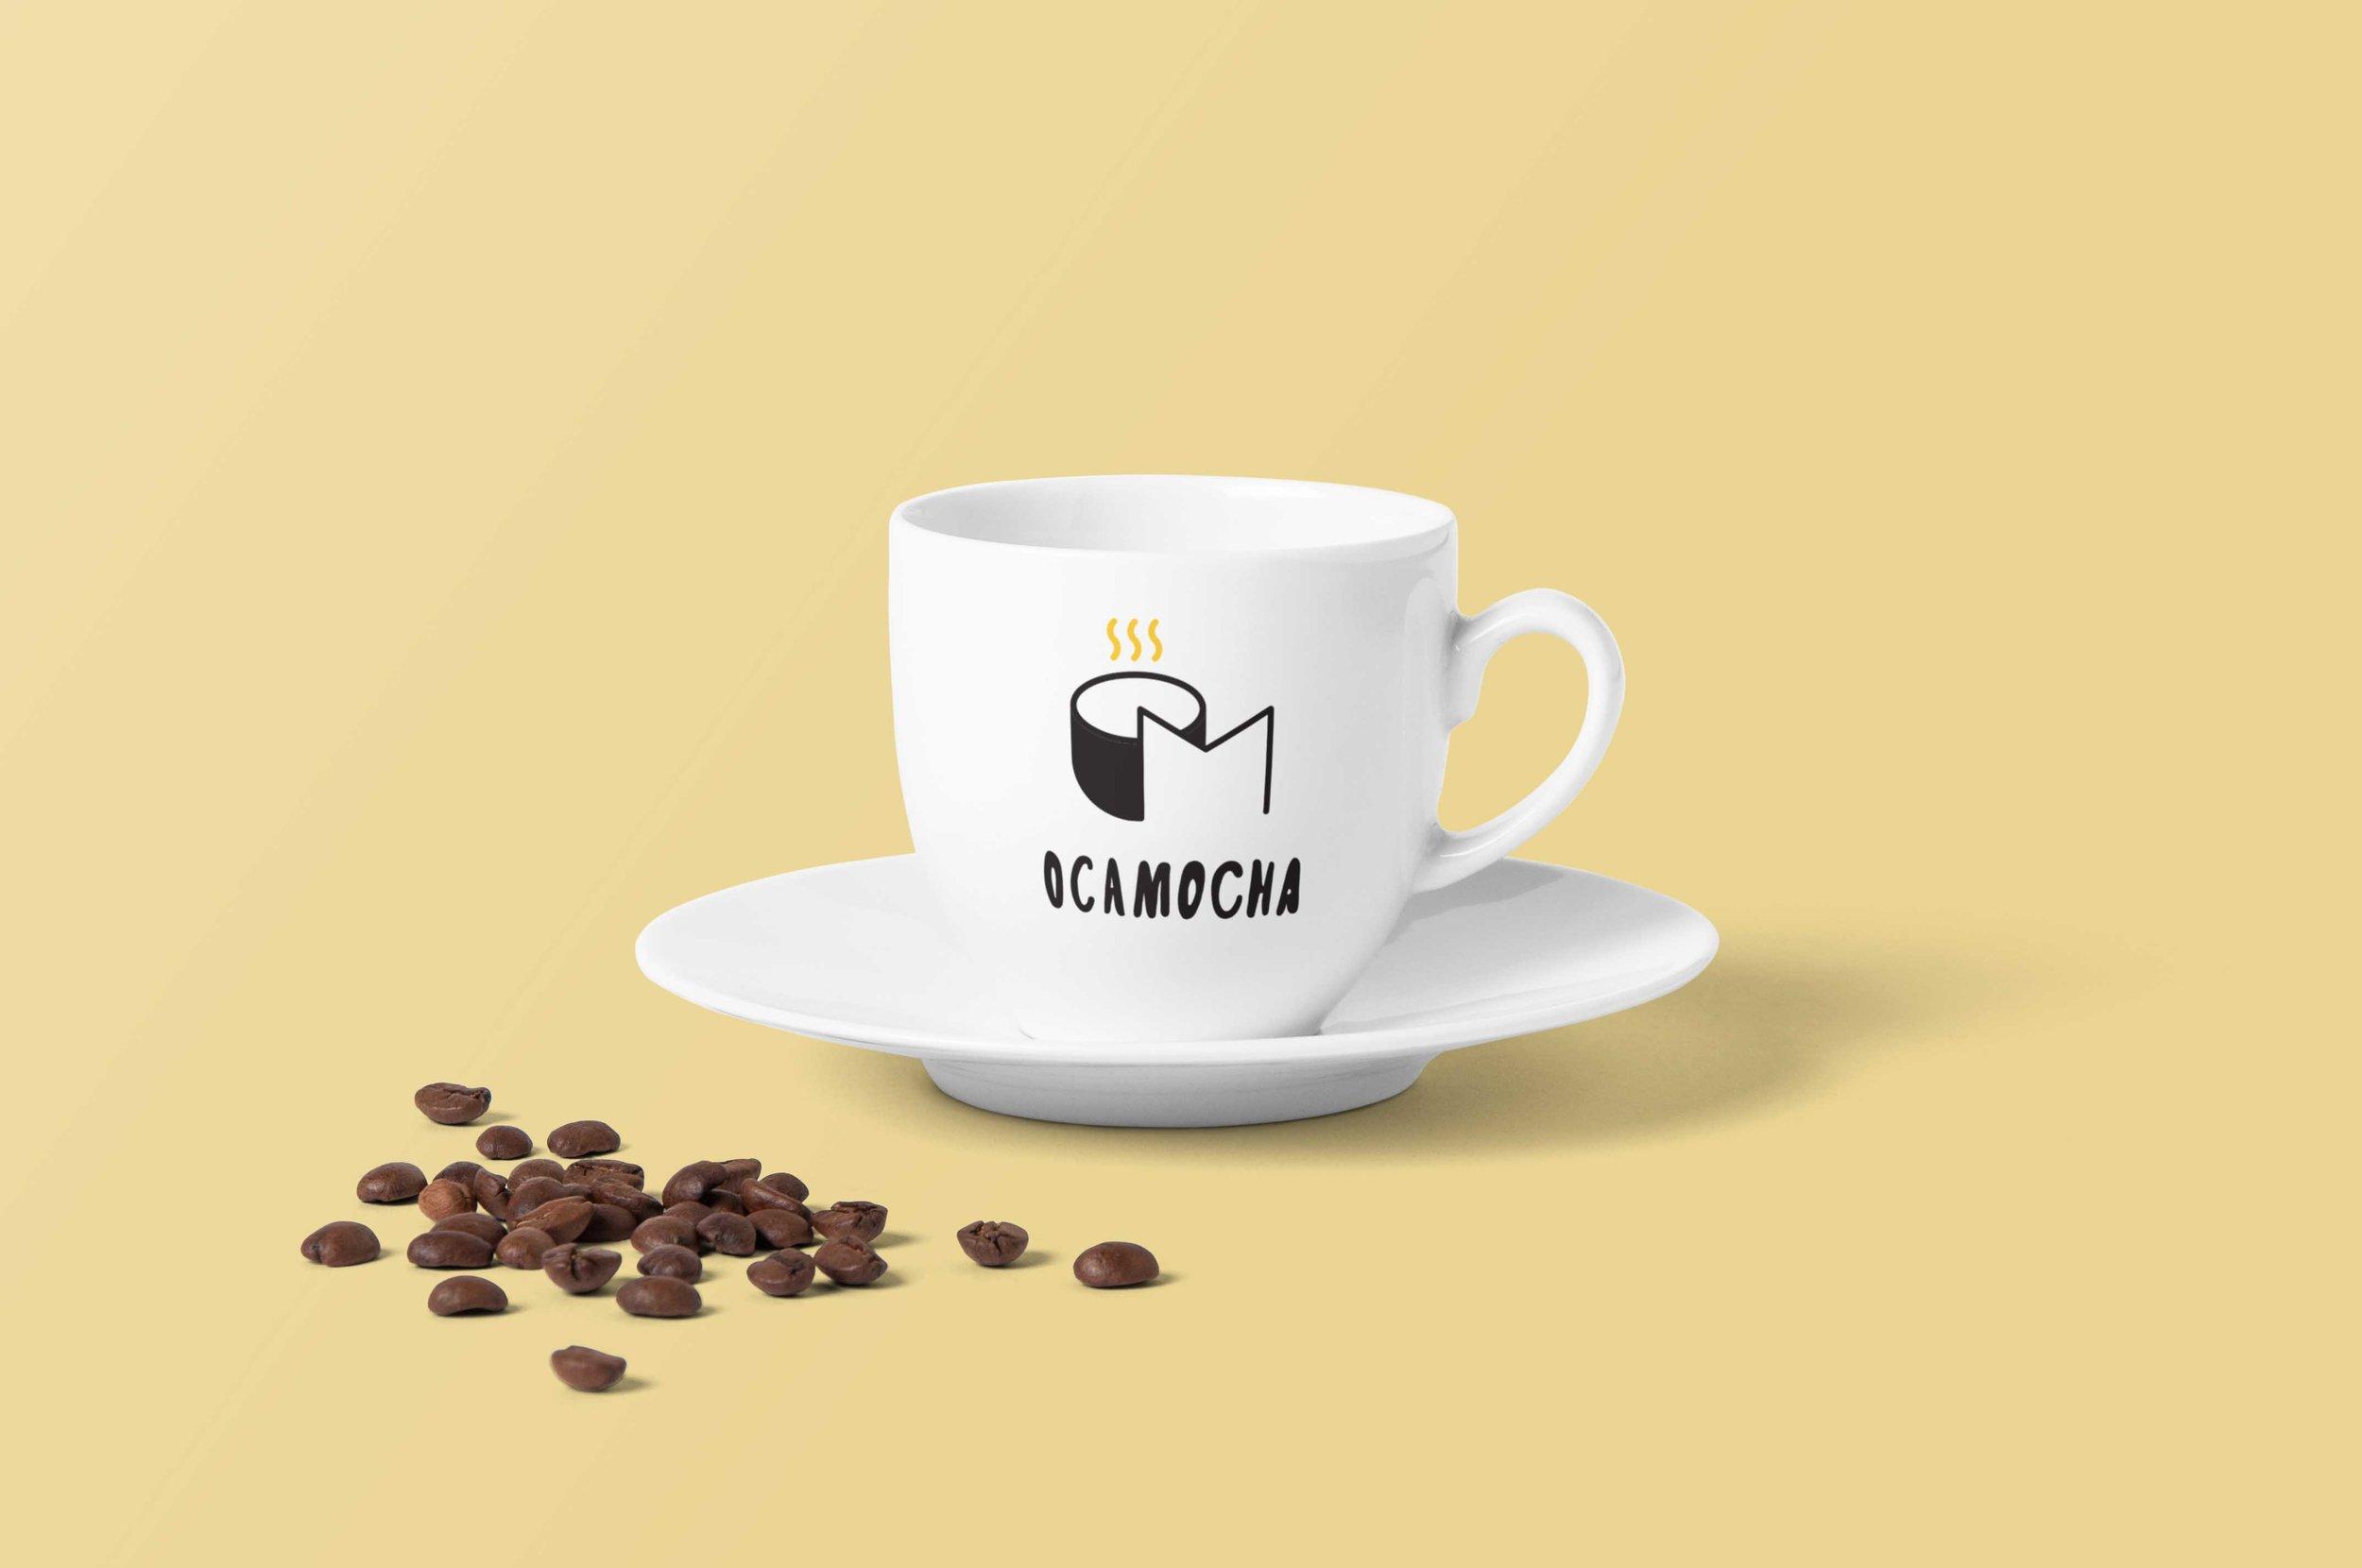 OCAMocha Branded Coffee Mug